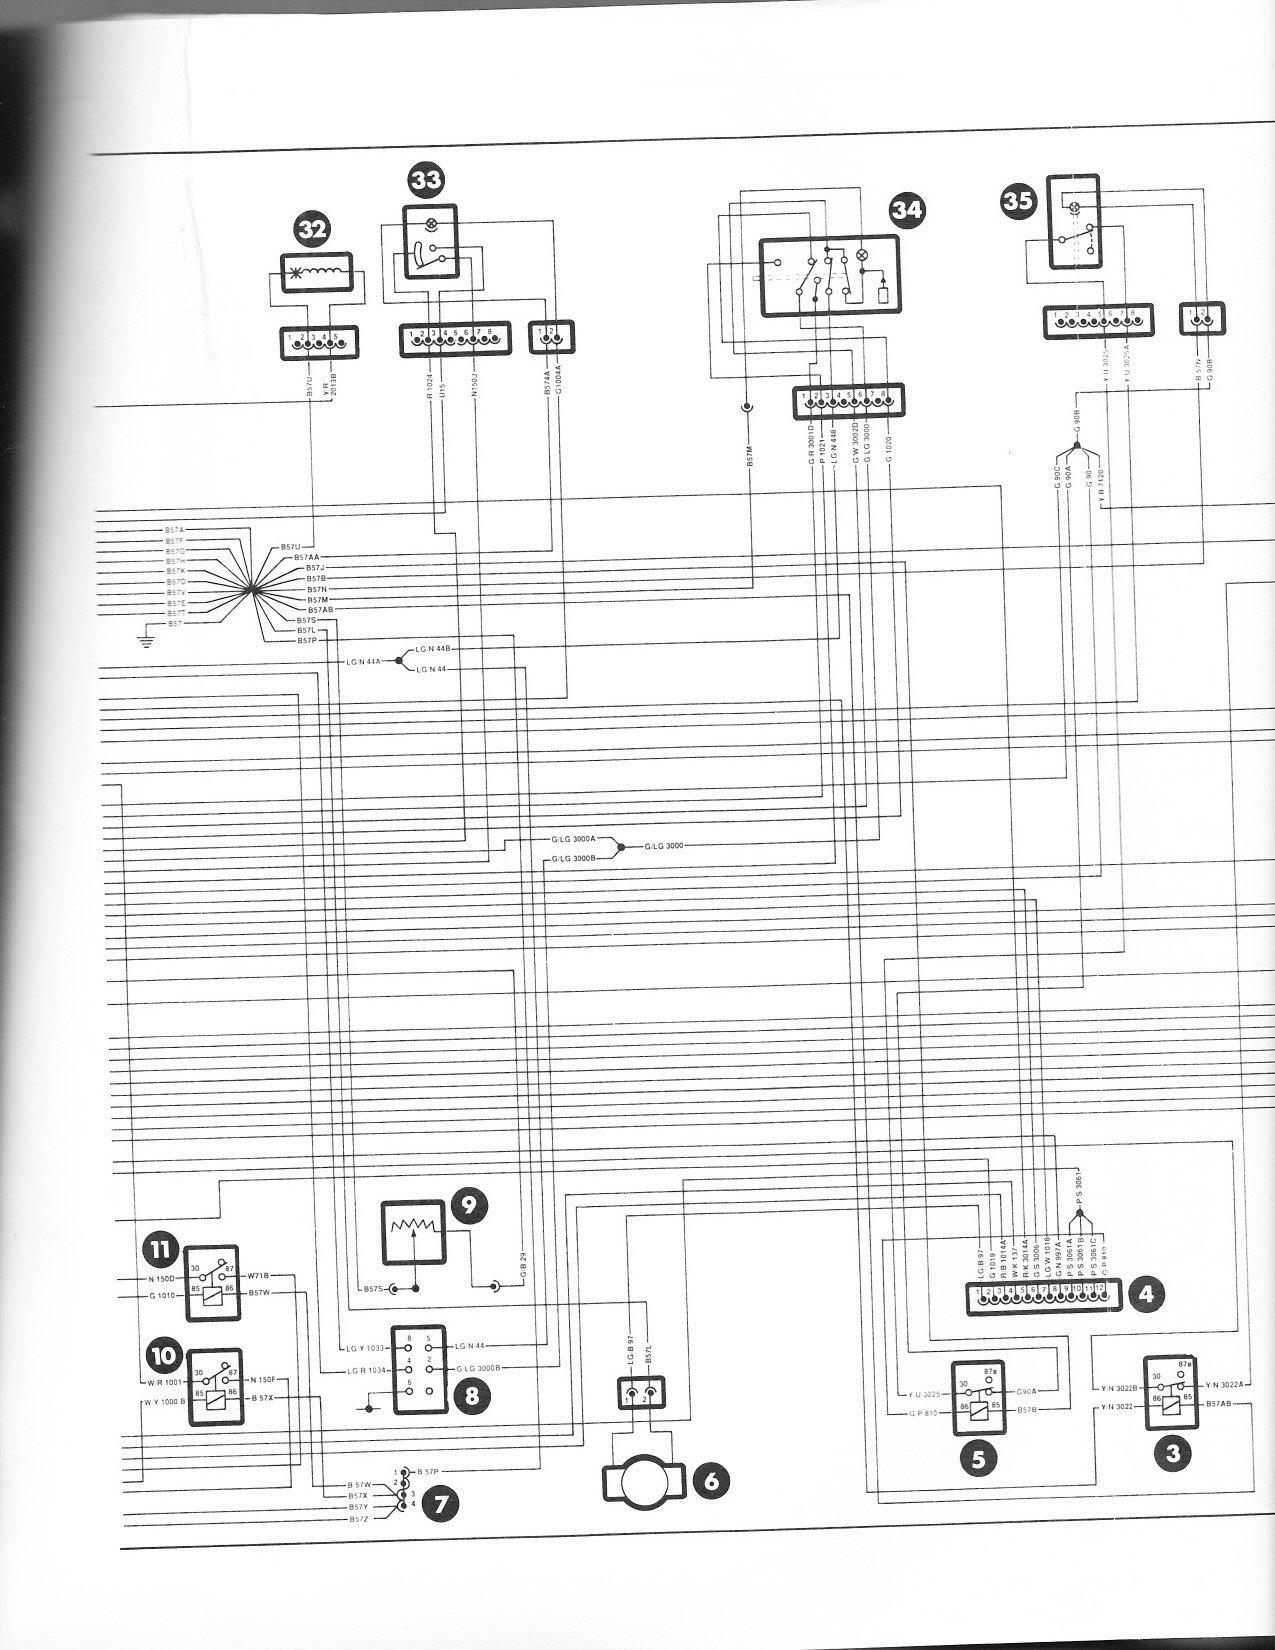 Ford 3230 Wiring Diagram